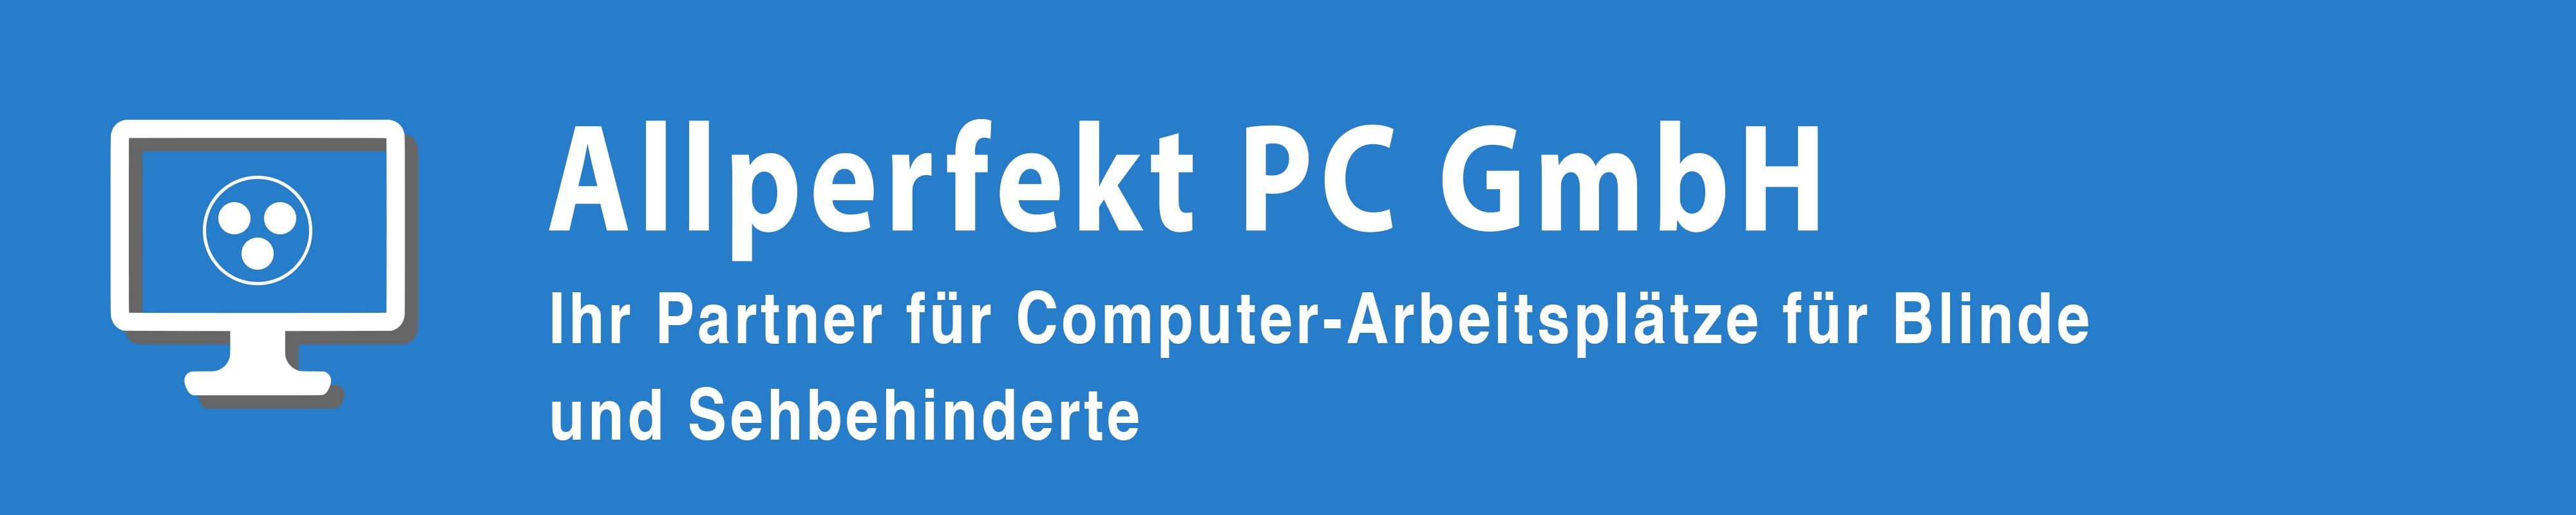 Allperfekt PC GmbH